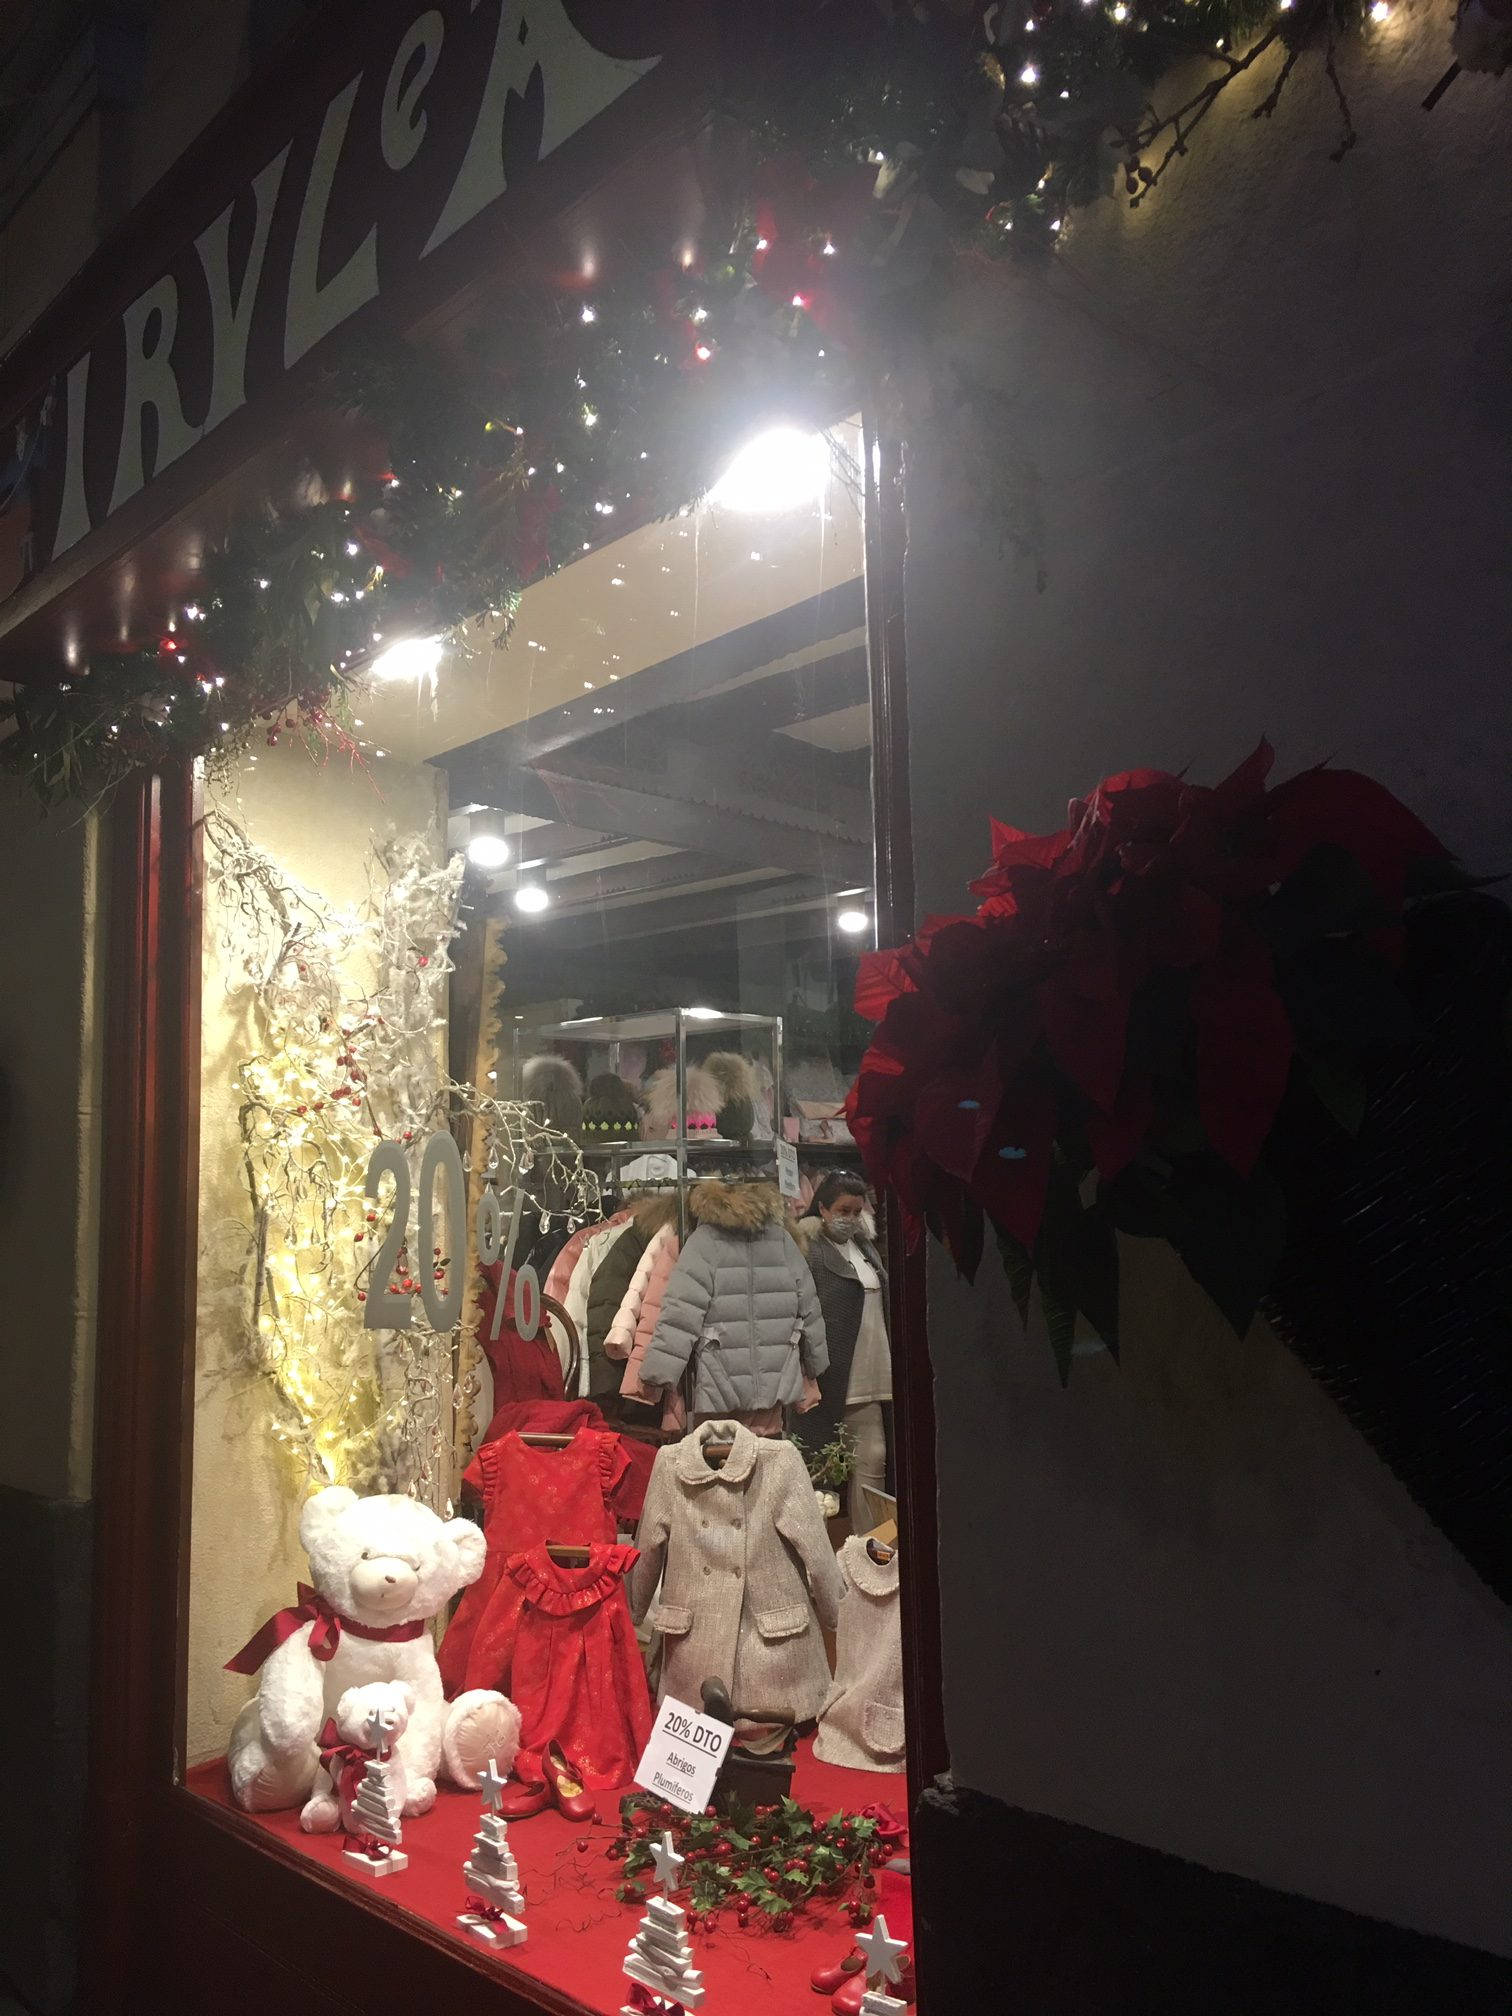 Irulea baby clothes in San Sebastian